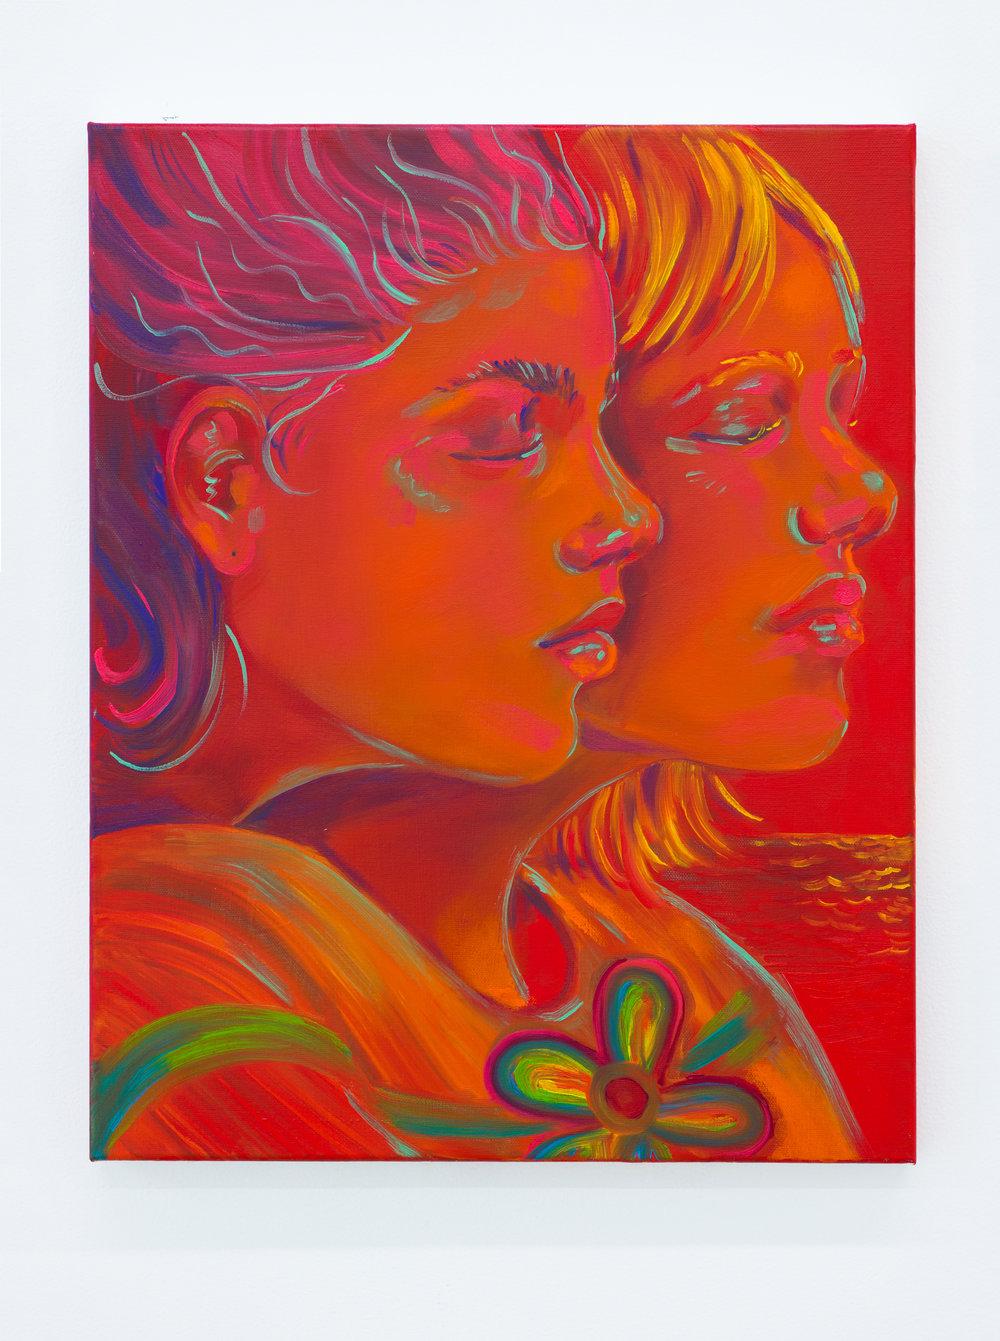 Haley Josephs   Memory Eternal,  2018 Oil on canvas 20 x 16 inches